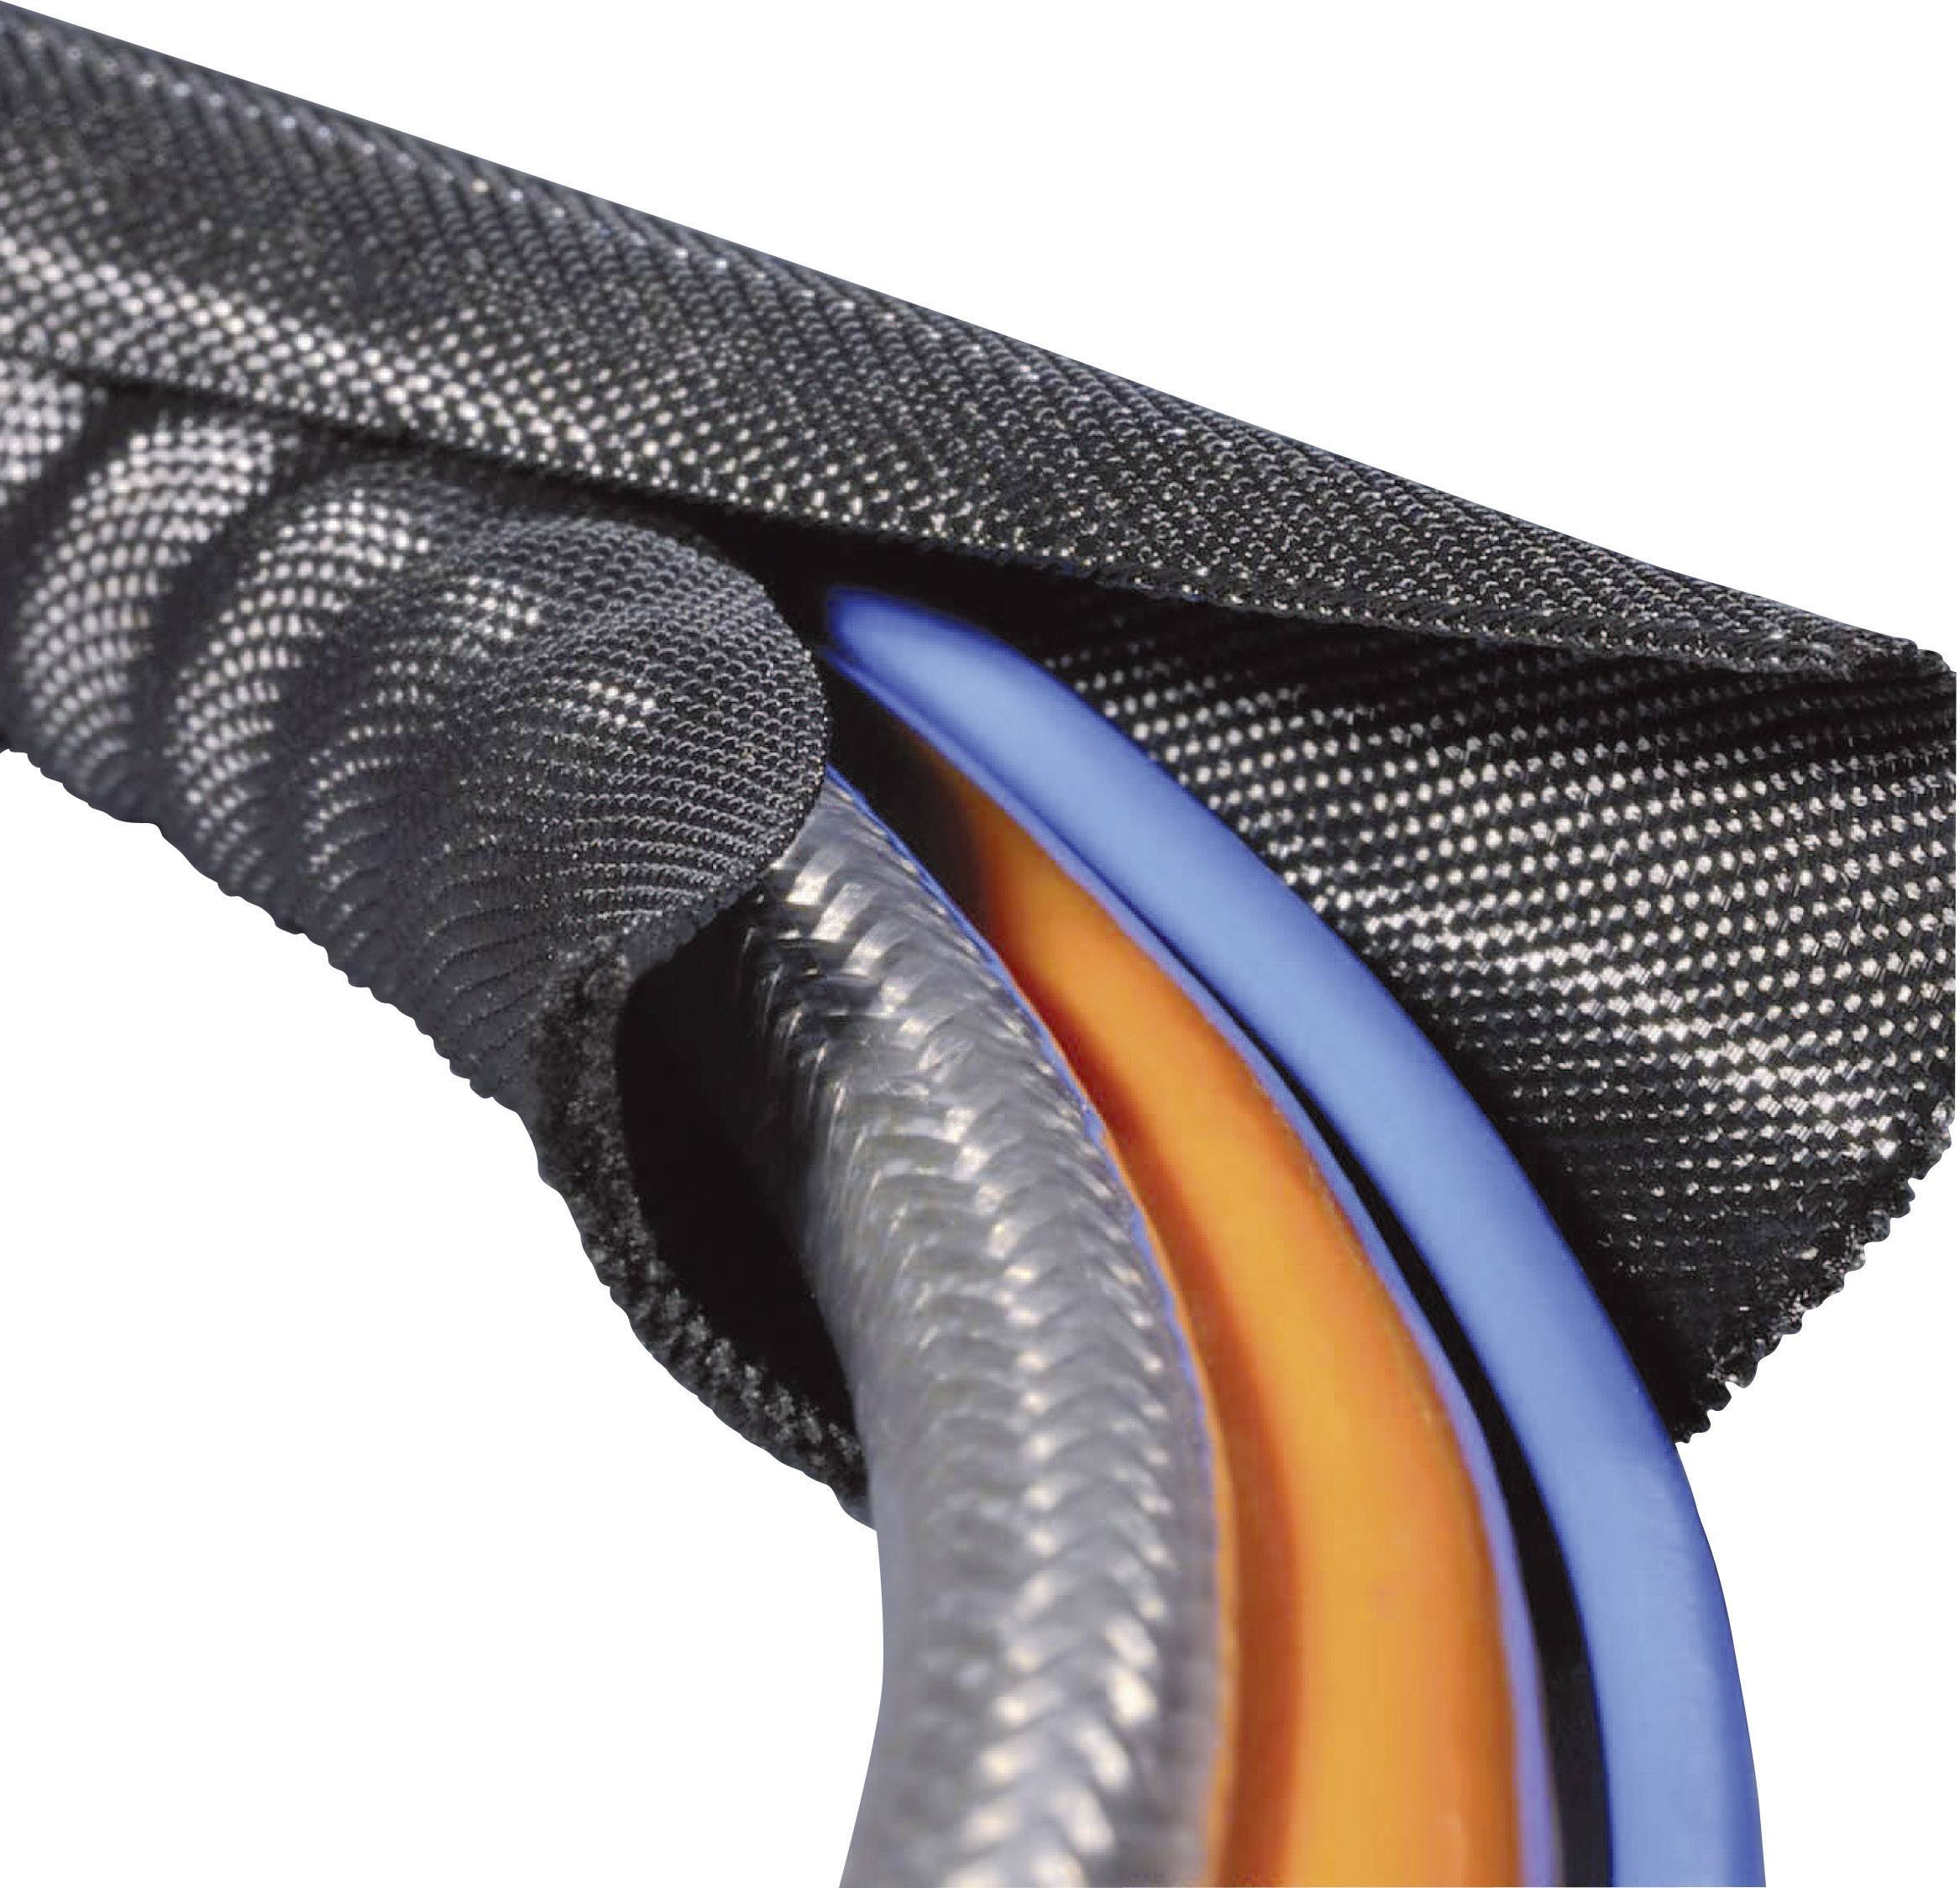 Ochranný oplet HellermannTyton Twist-In 08, 5 do 8 mm, -70 do +125 °C, metrový tovar, čierna